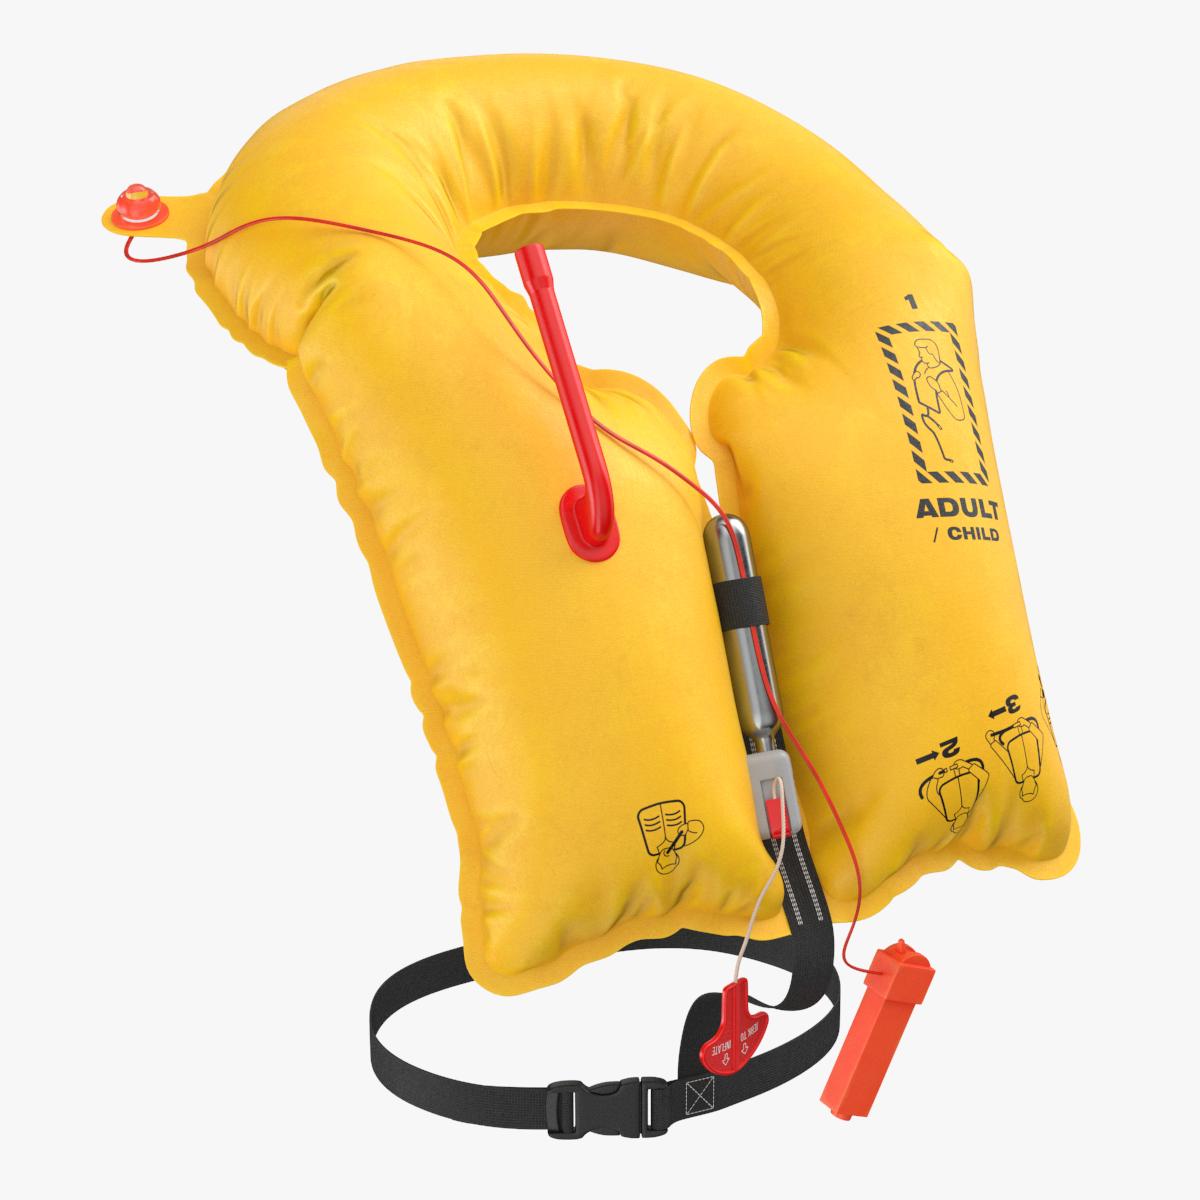 Aircraft Life Jacket Clear 3D model Equipment Wear Clothes